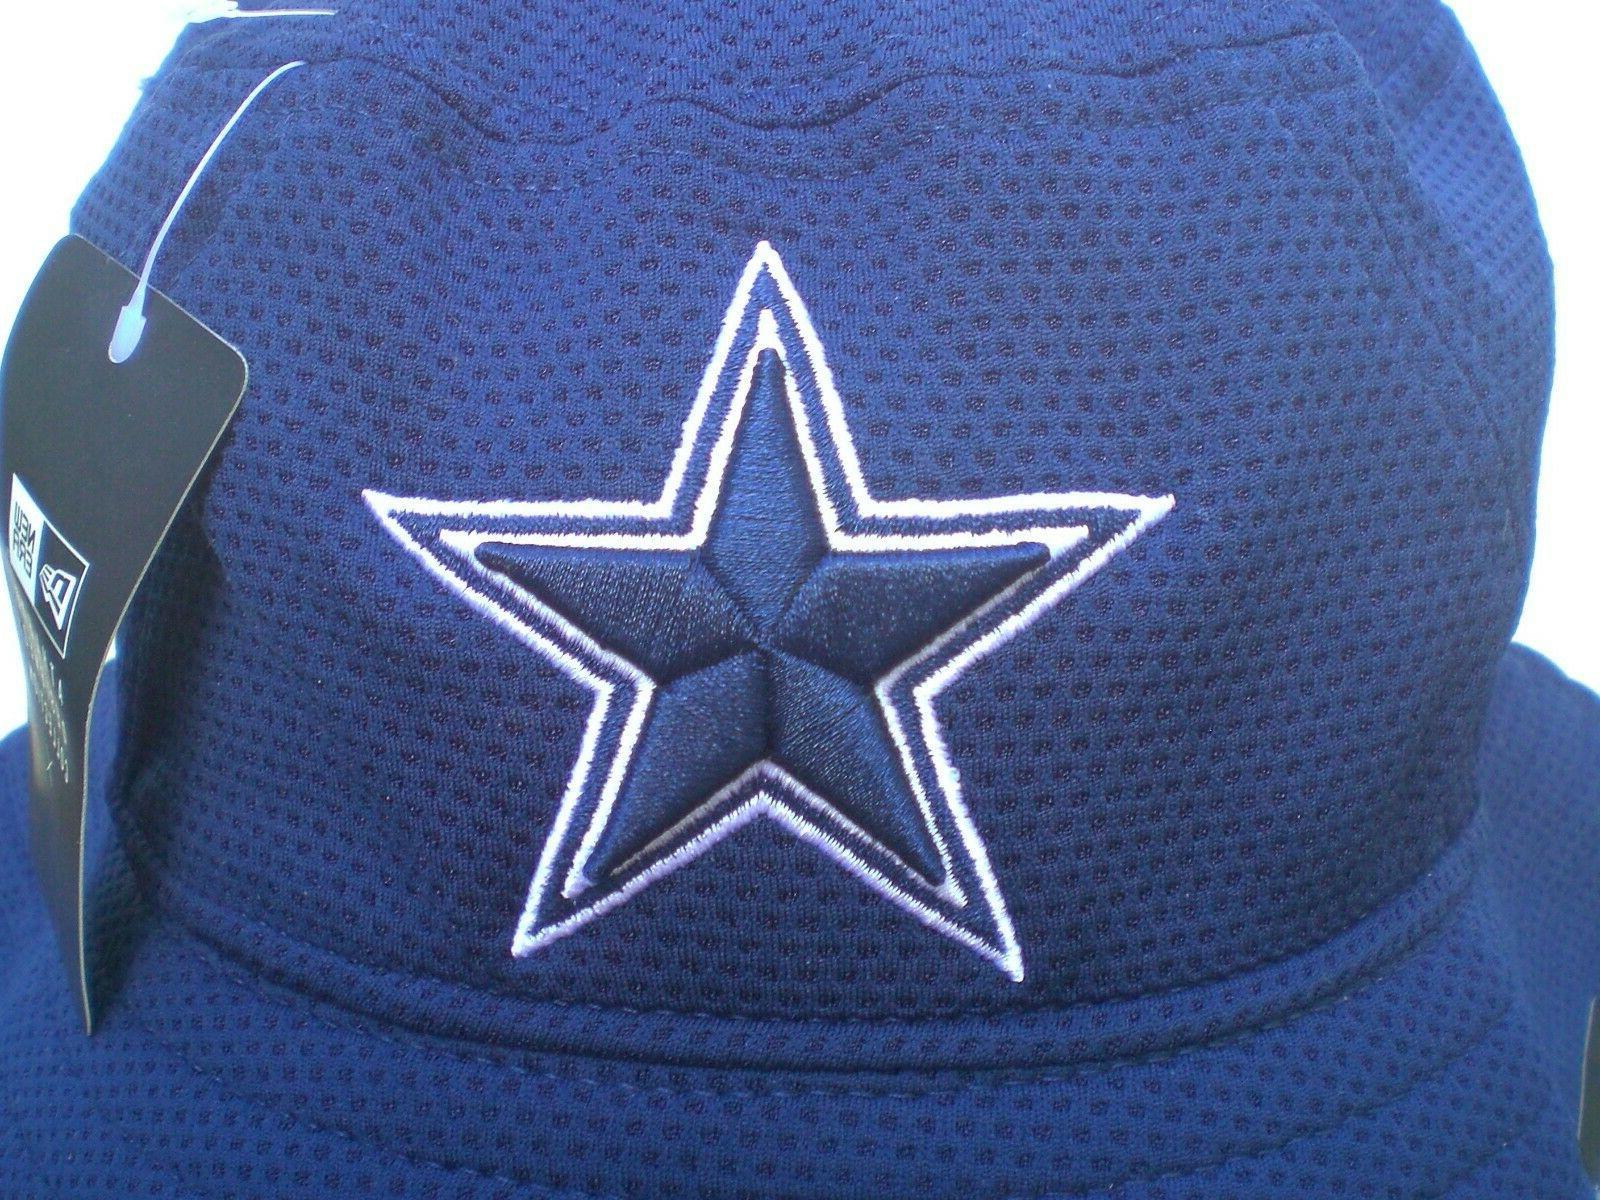 New Navy Blue Bucket Hat